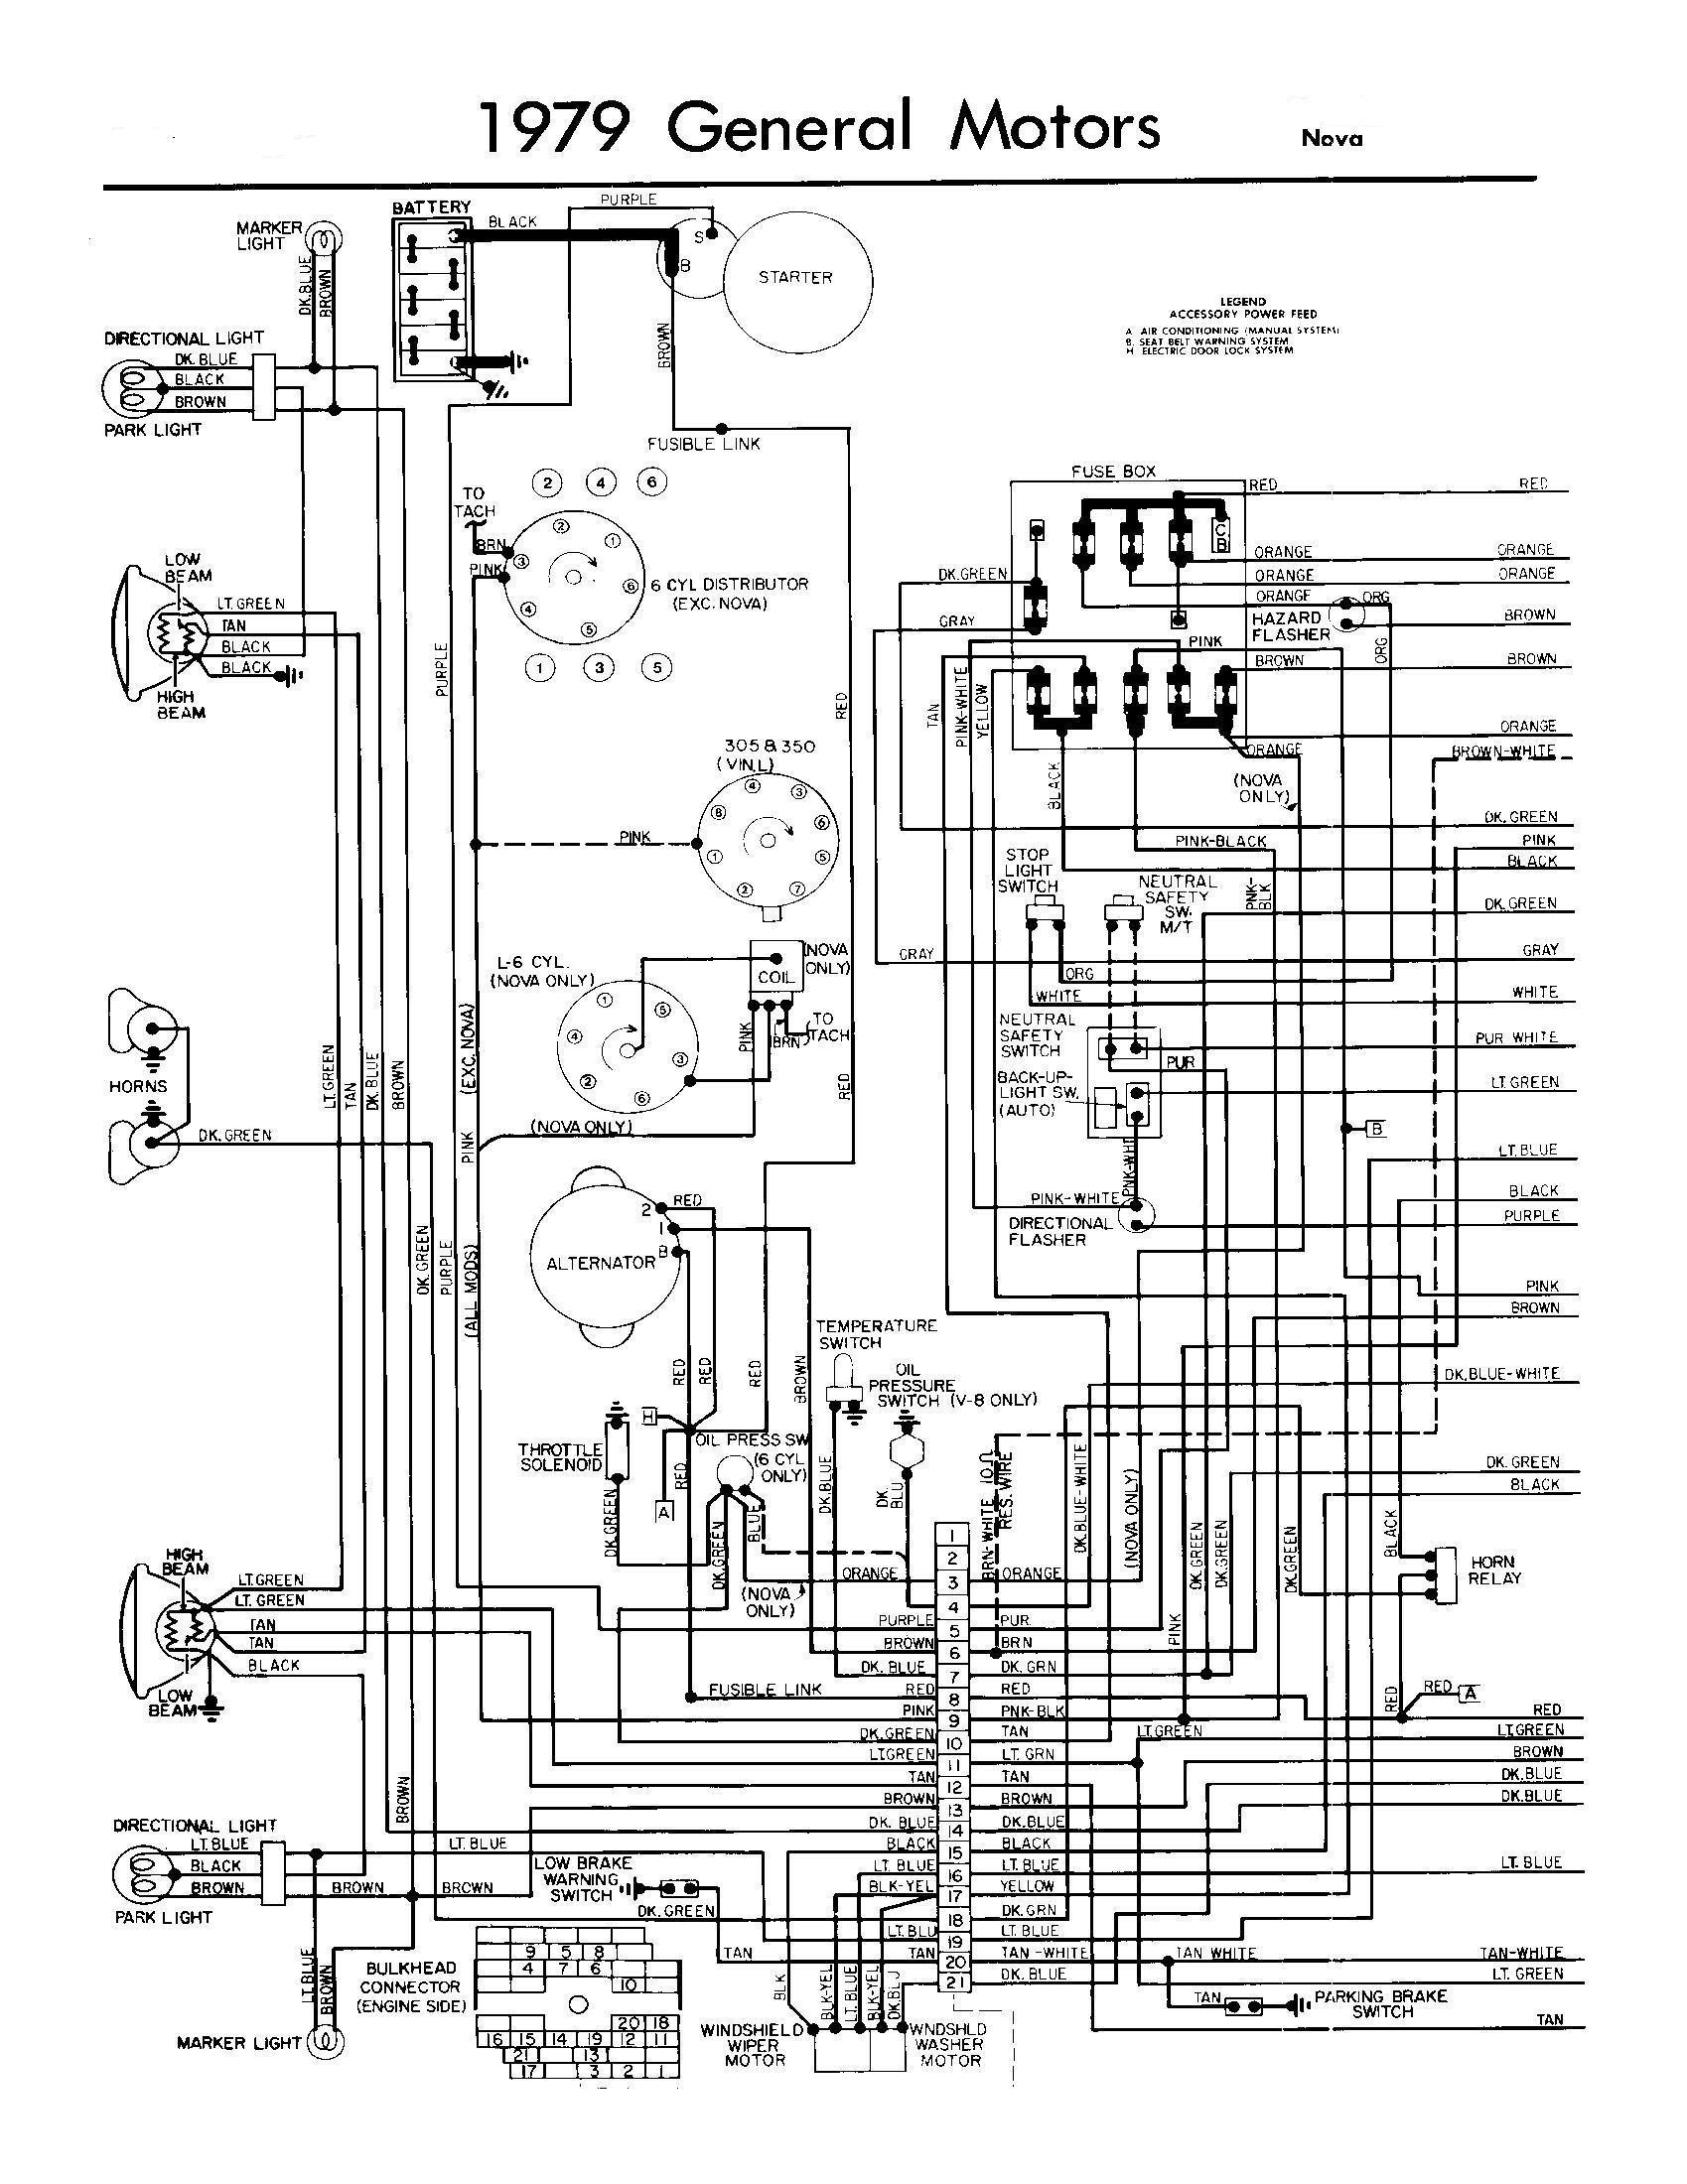 Chevy Suburban Parts Diagram All Generation Wiring Schematics Chevy Nova forum Of Chevy Suburban Parts Diagram